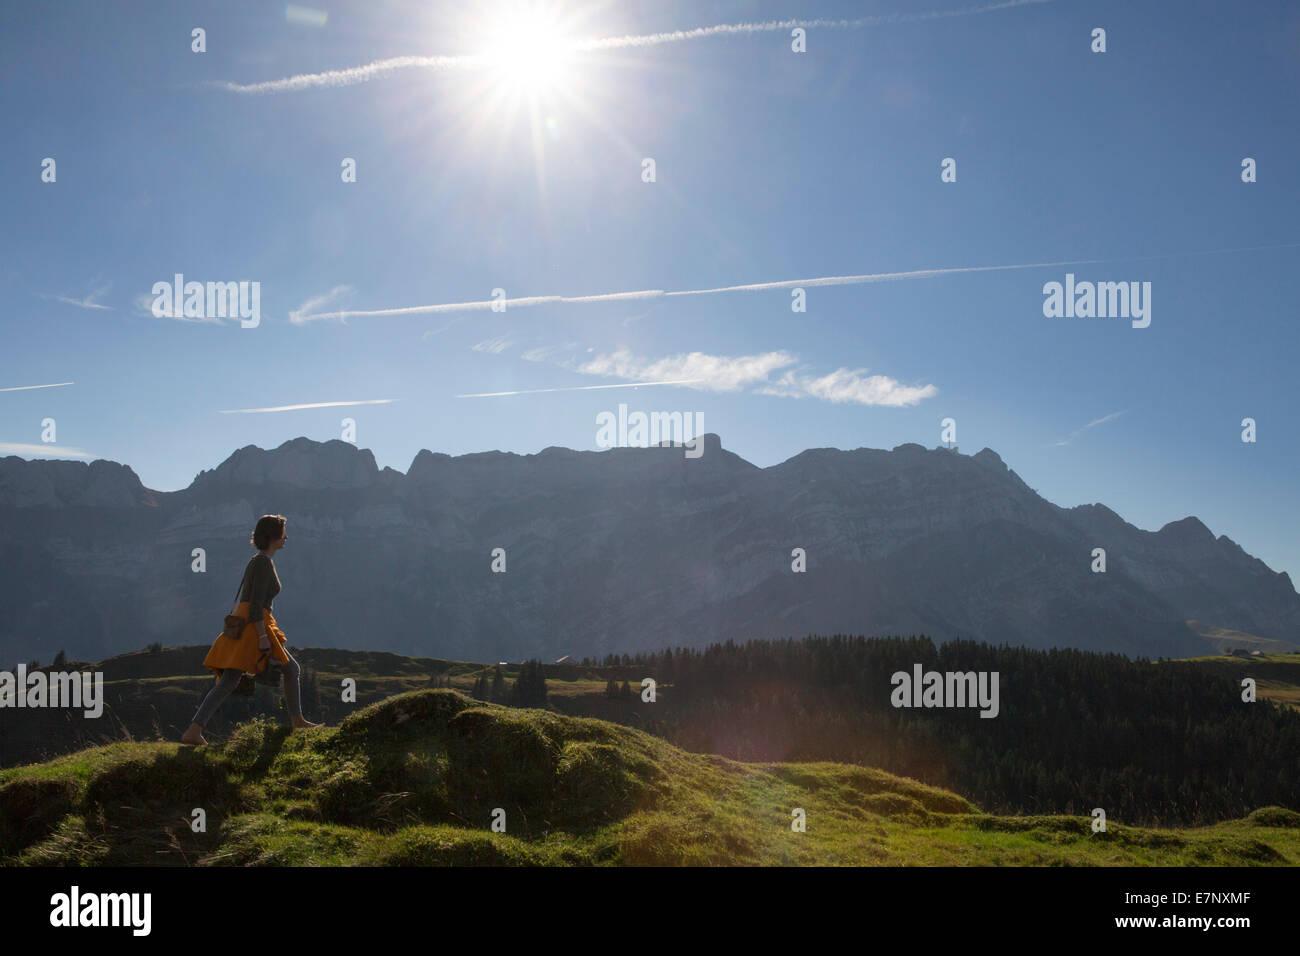 Alpstein, barefooted, walking, Kronberg, mountain, mountains, canton, Appenzell, Innerroden, Alpstein, Säntis, - Stock Image